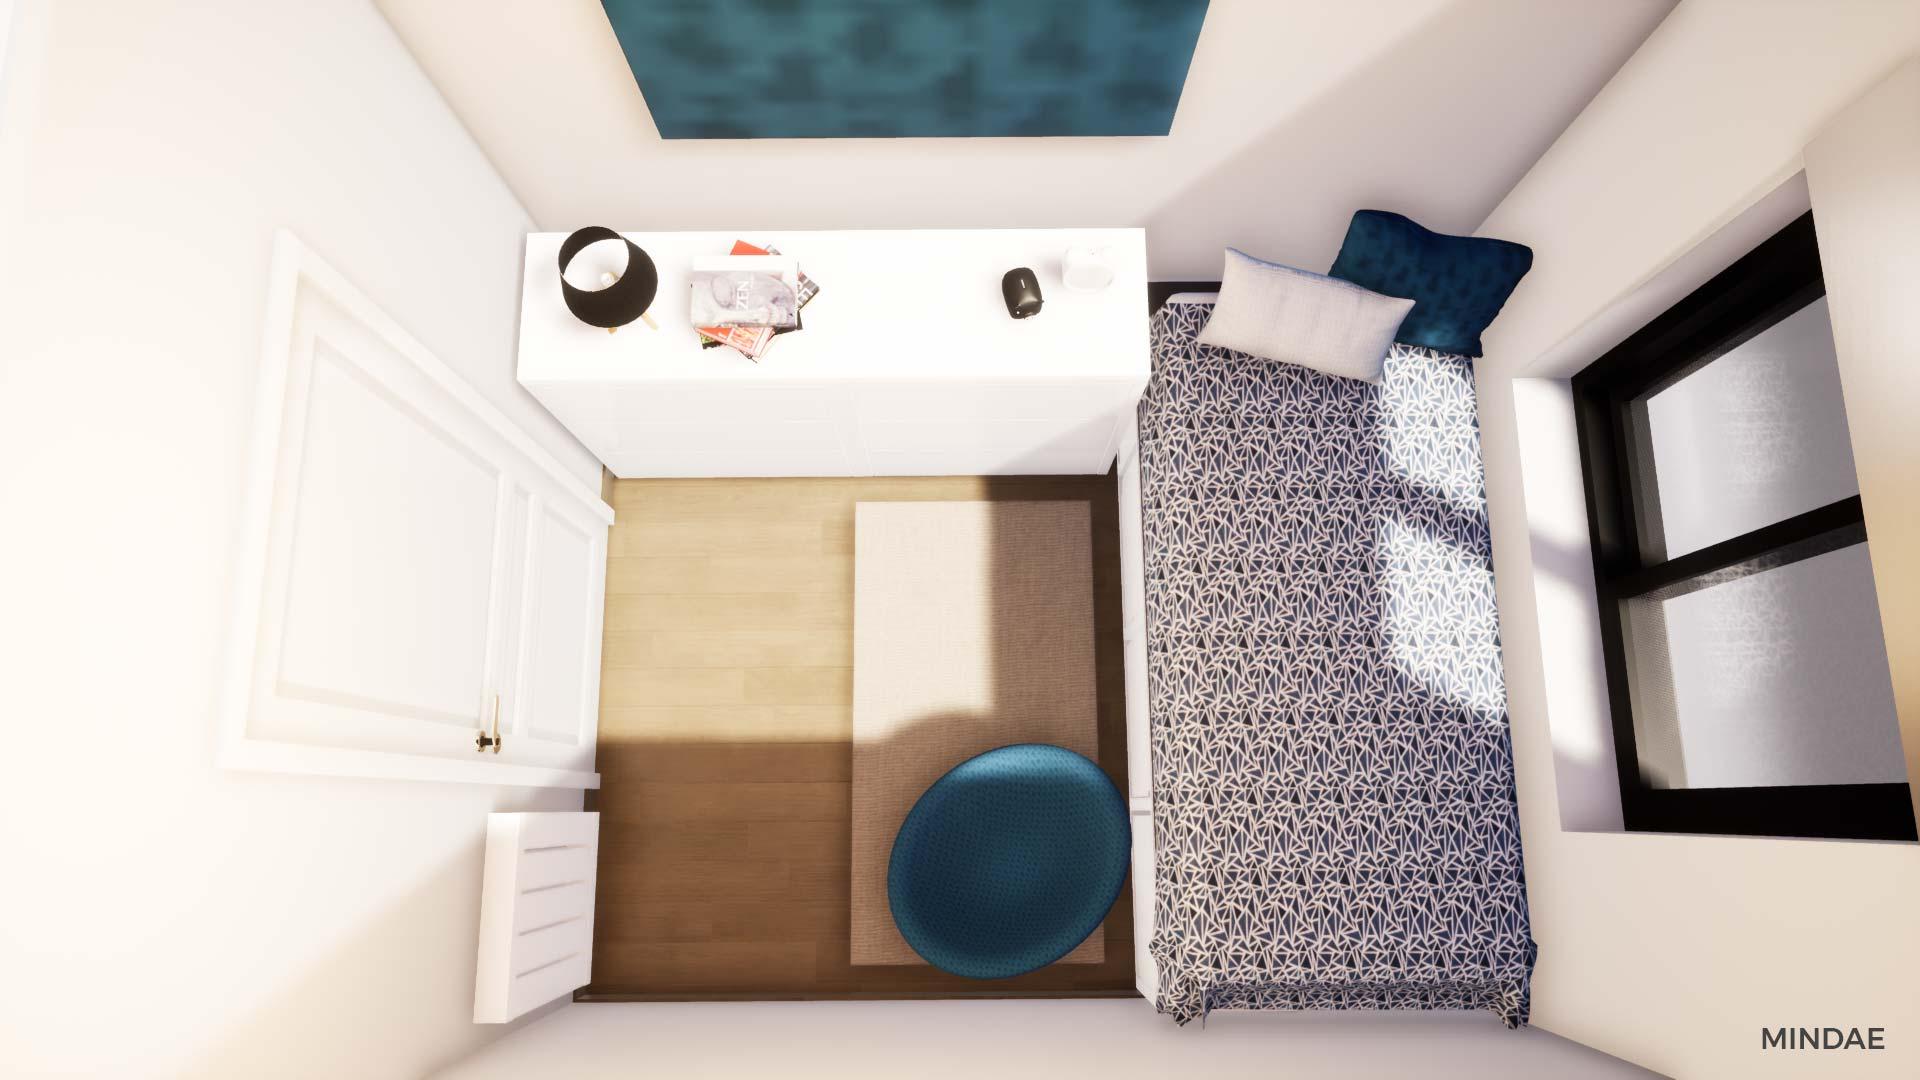 Mindae_3D_appartement_studio_étudiant_homestaging_immobilier_location-(2)